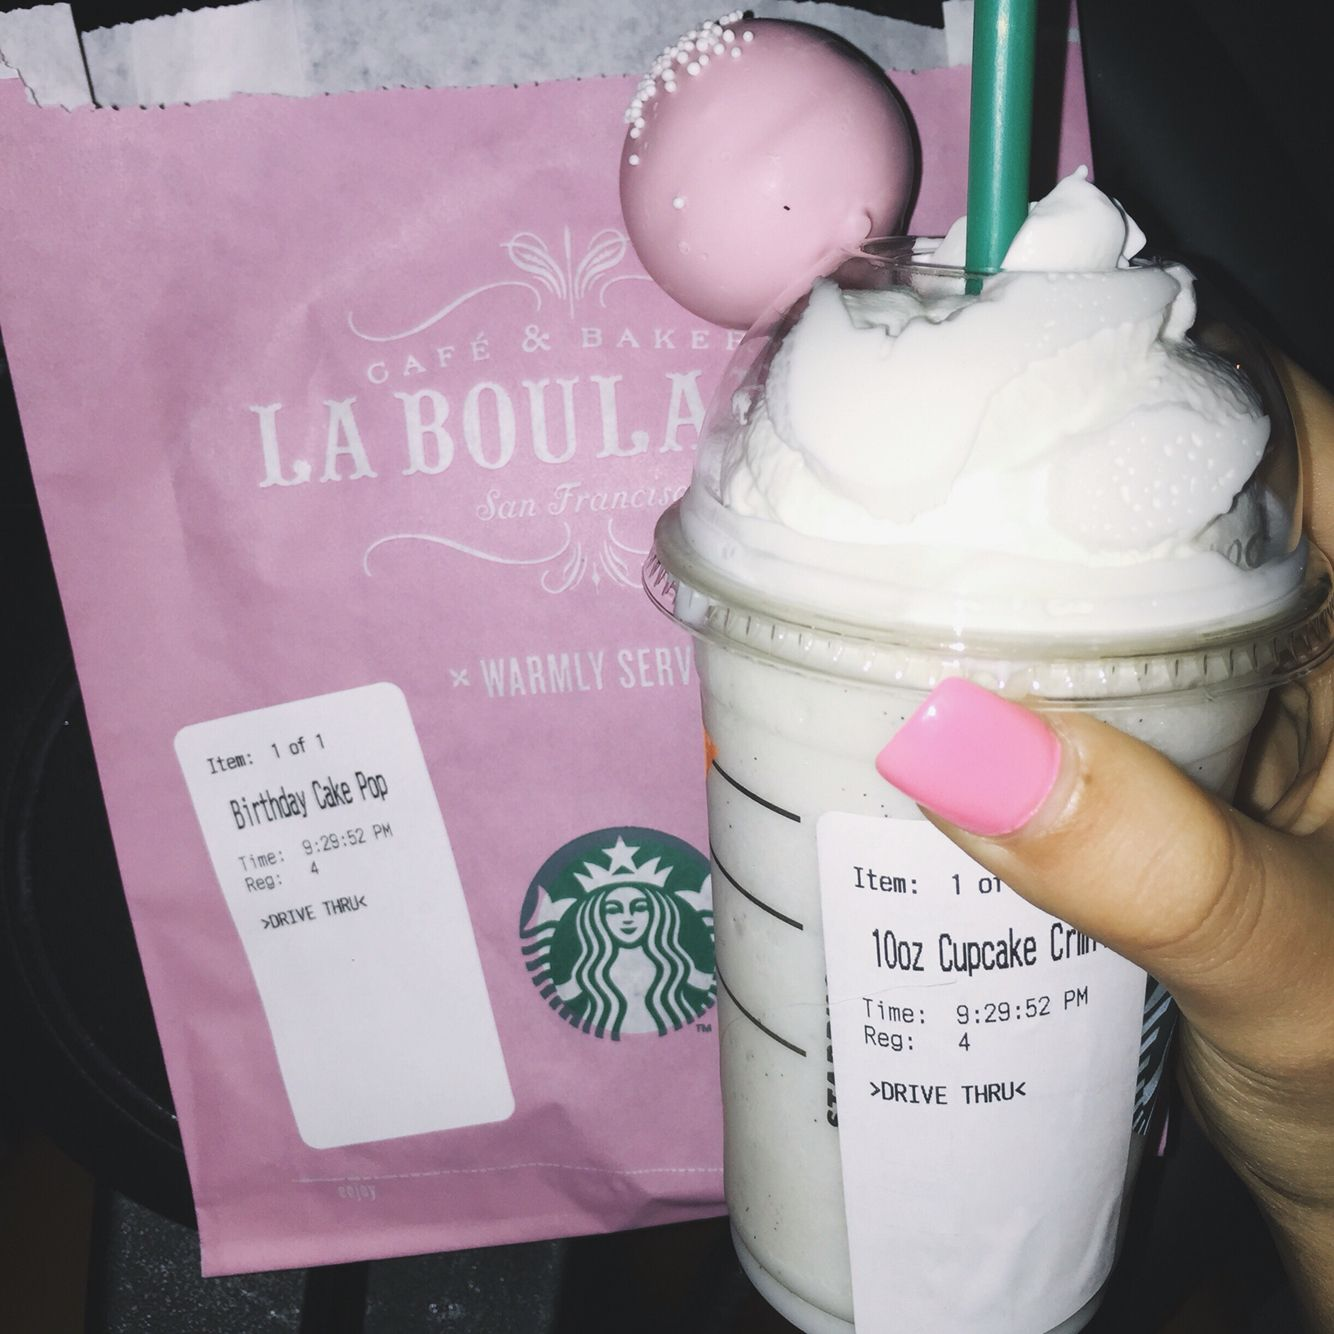 Sensational Mini Cupcake Frappuccino And Birthdaycake Cakepop With Images Funny Birthday Cards Online Alyptdamsfinfo